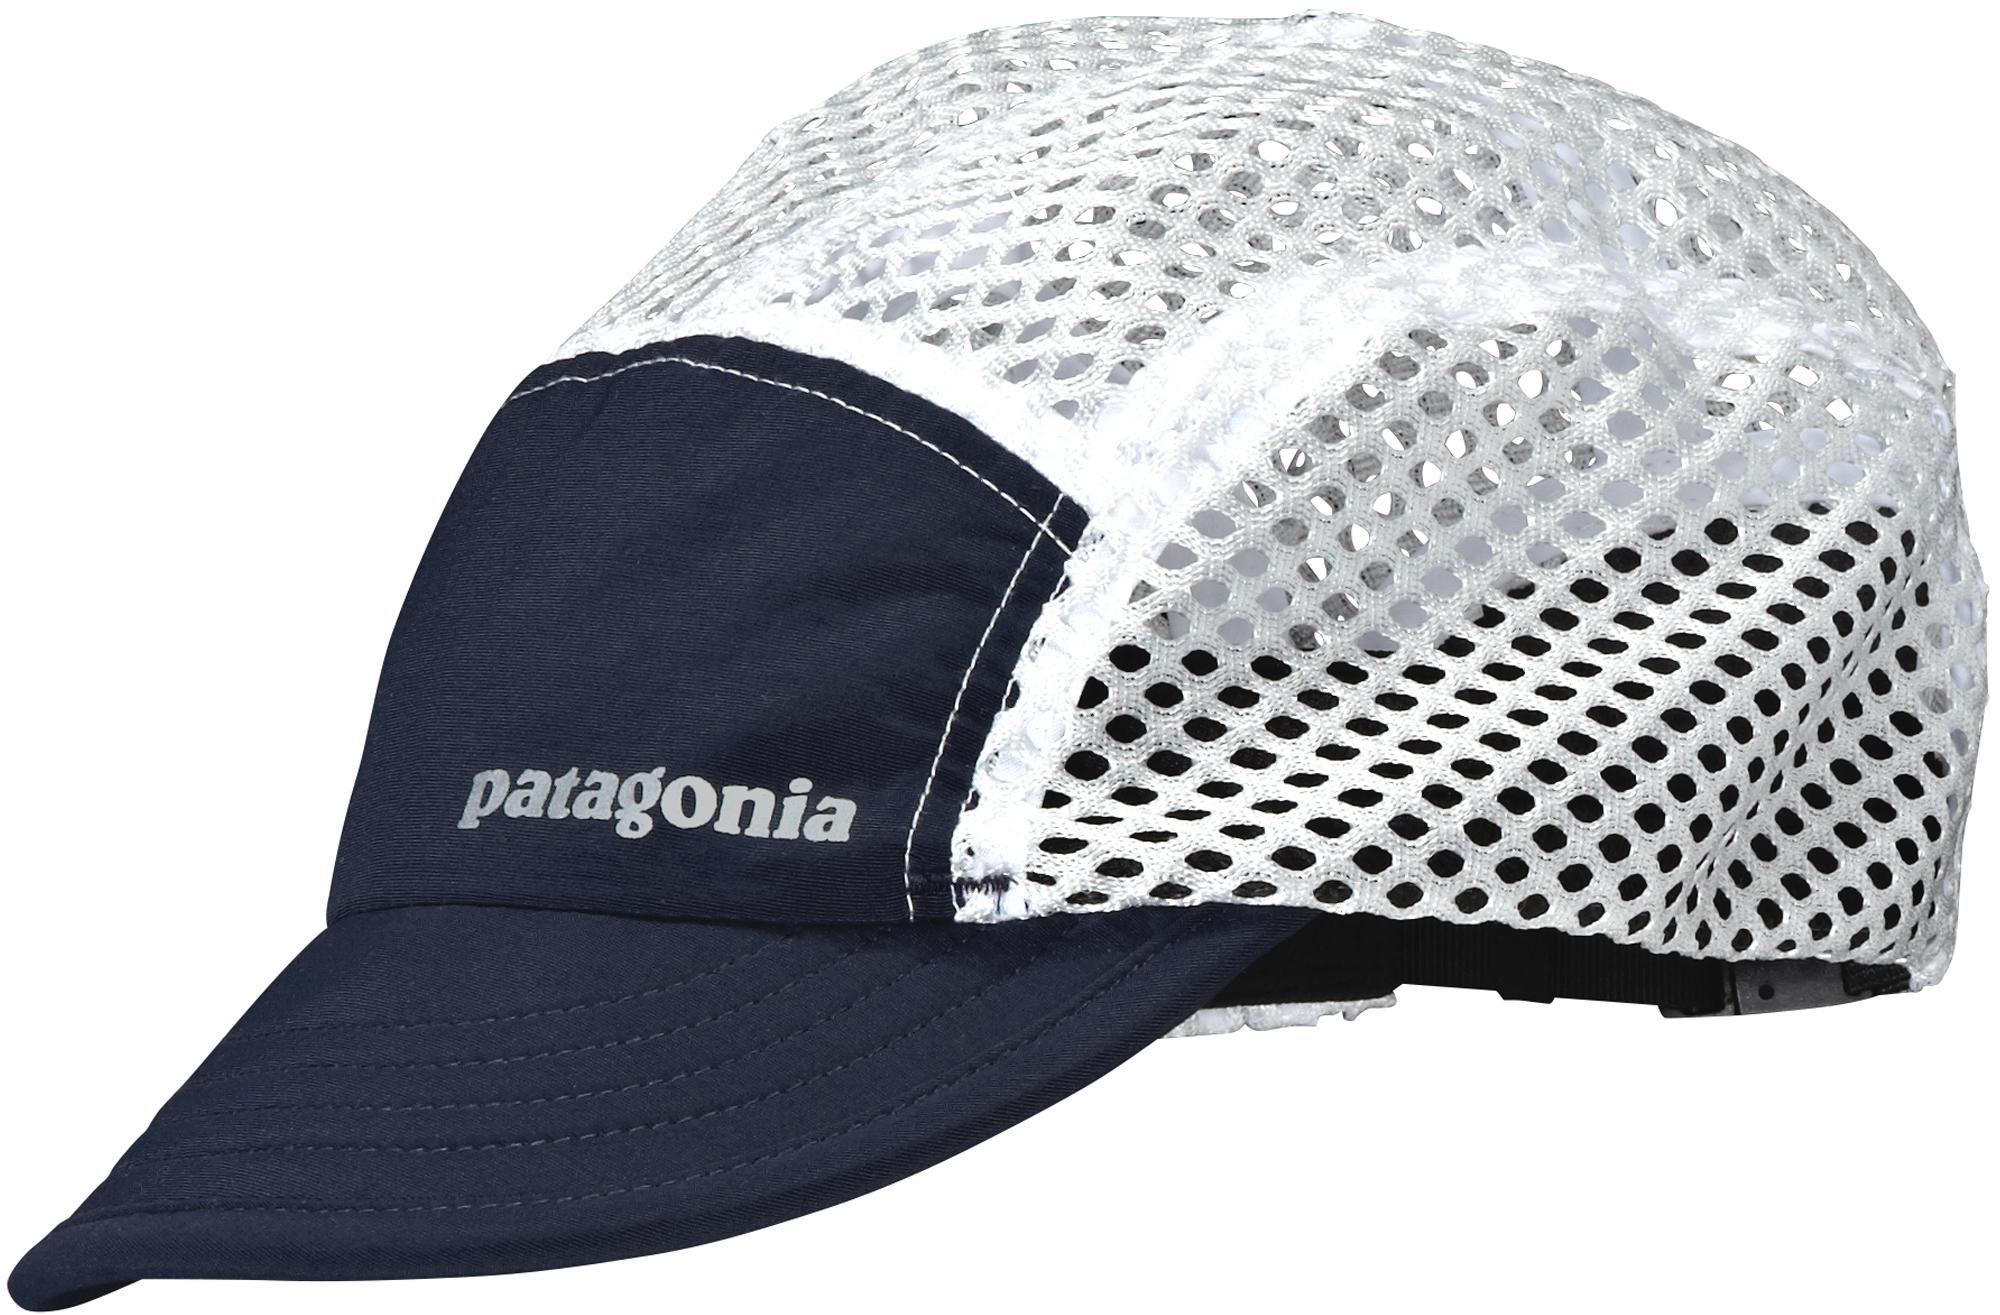 a95e08adb50 Patagonia Duckbill Cap - Women's | MEC